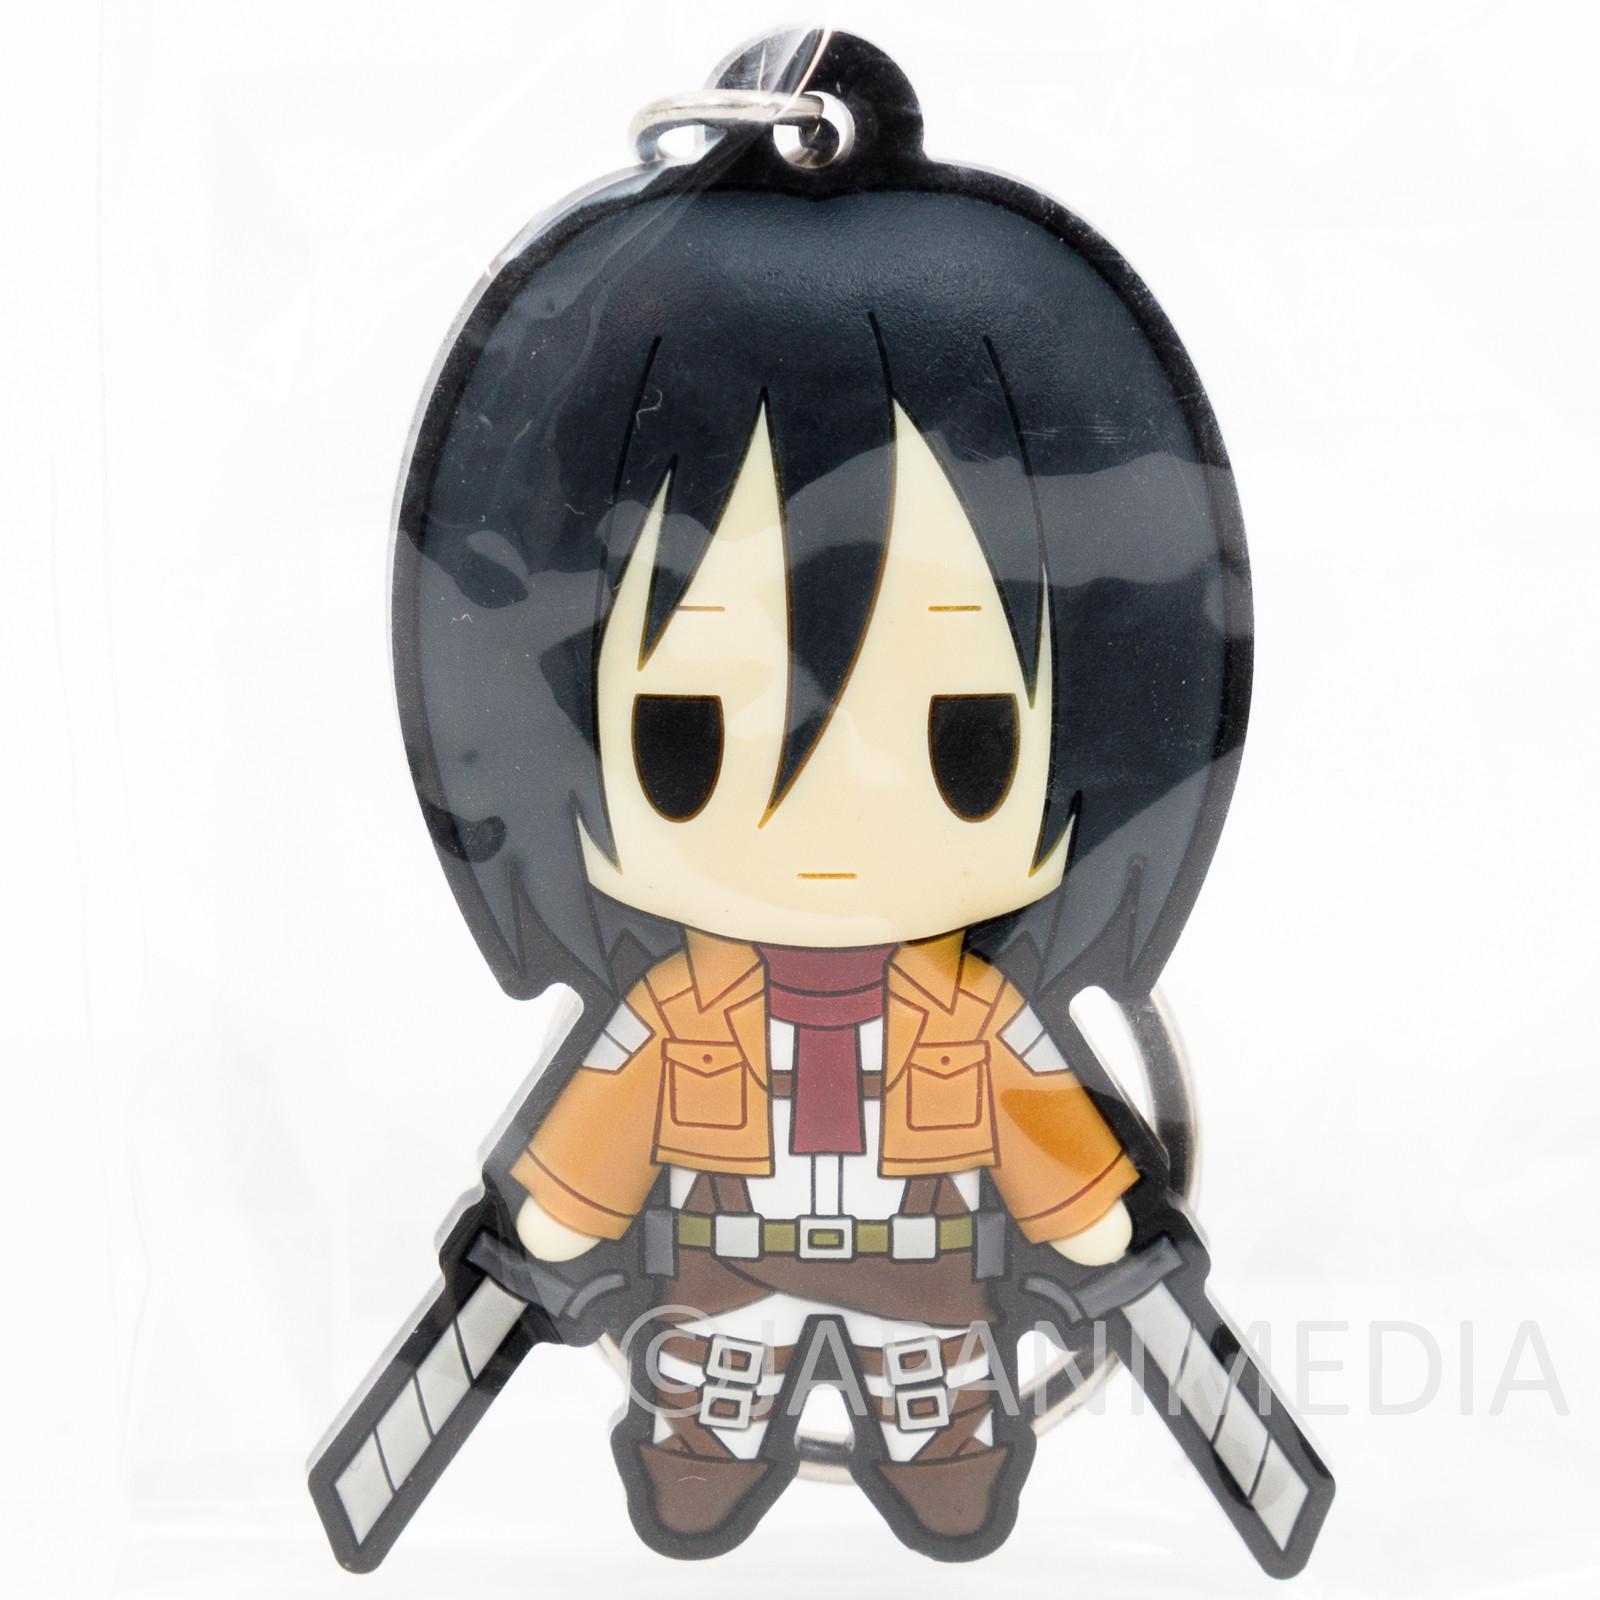 Attack on Titan Mikasa Ackerman Rubber Mascot Keychain JAPAN ANIME